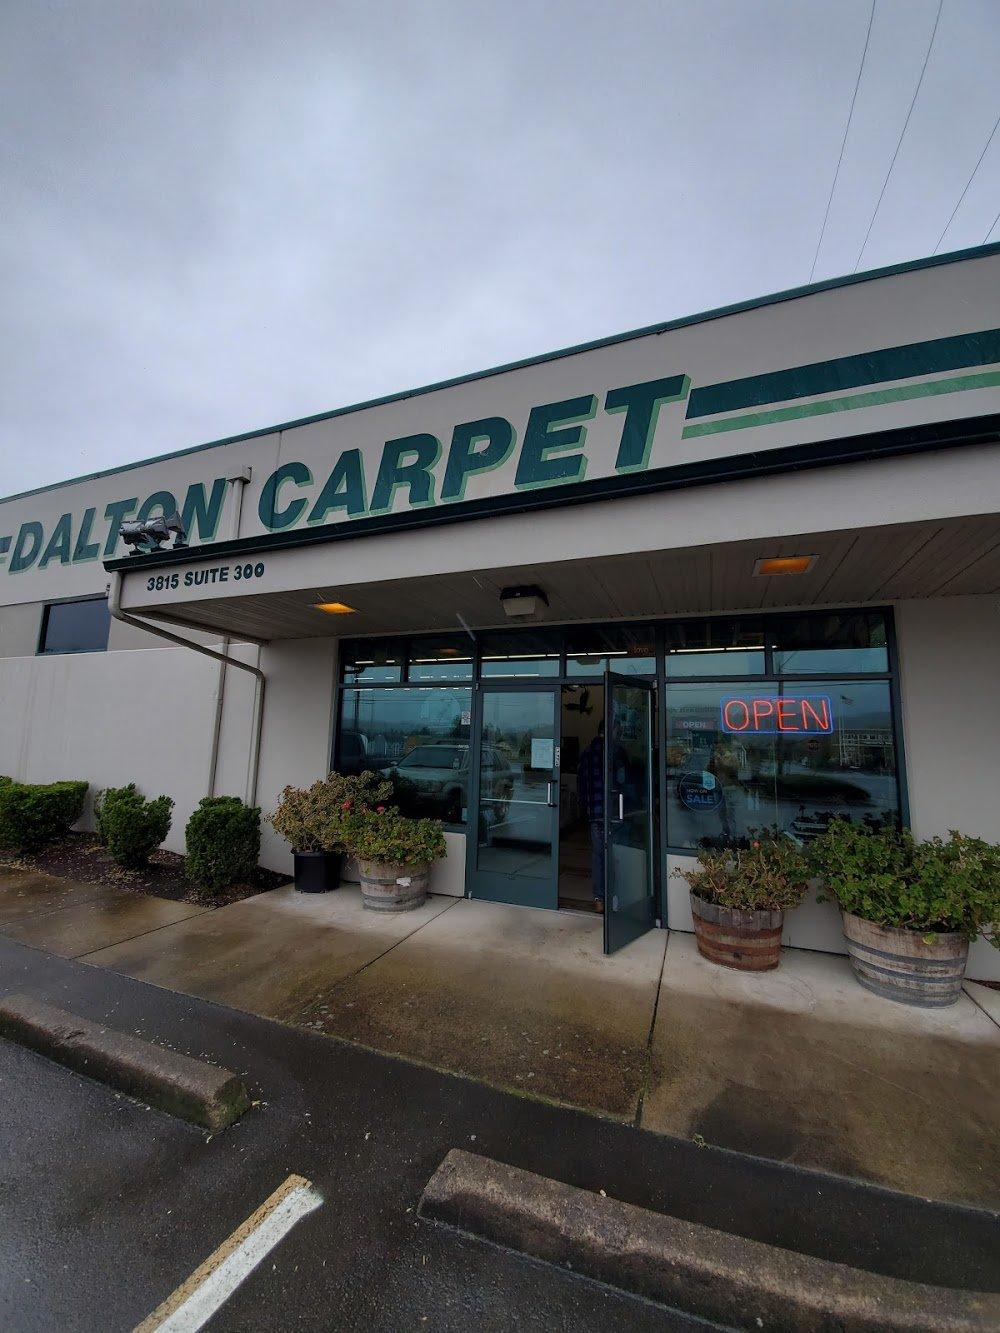 Dalton Carpet